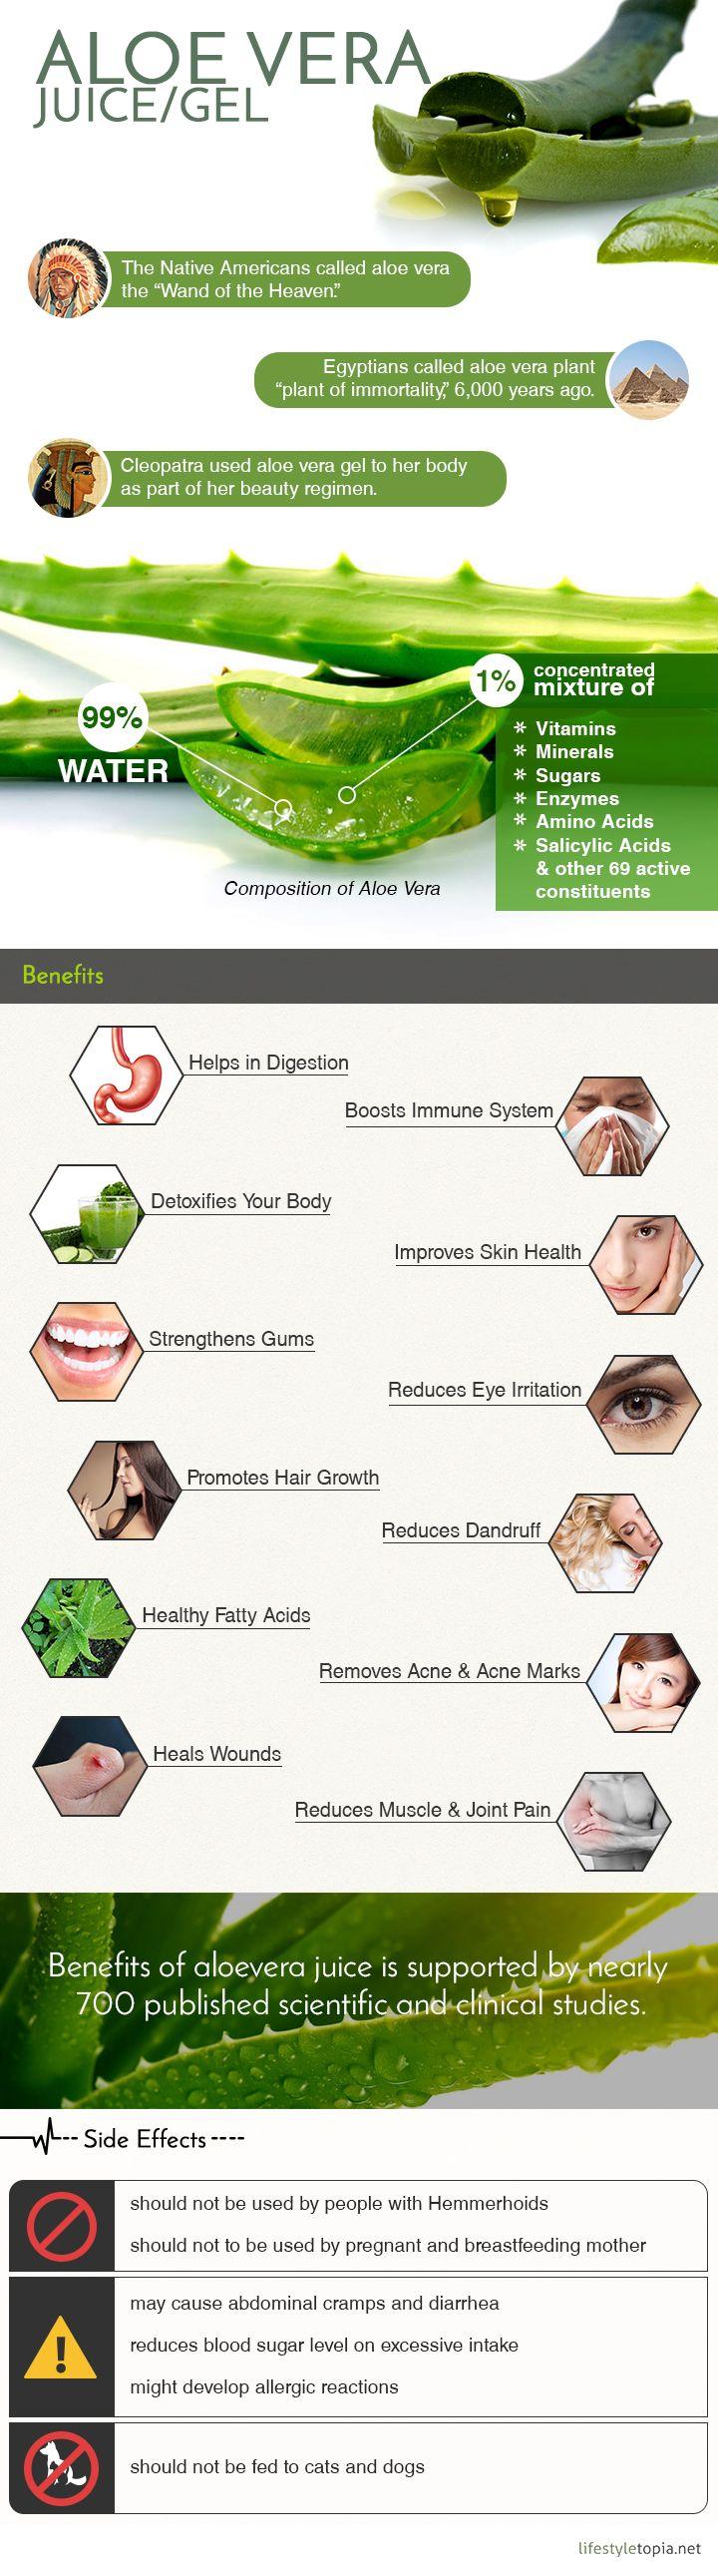 The Benefits Of Aloe Vera